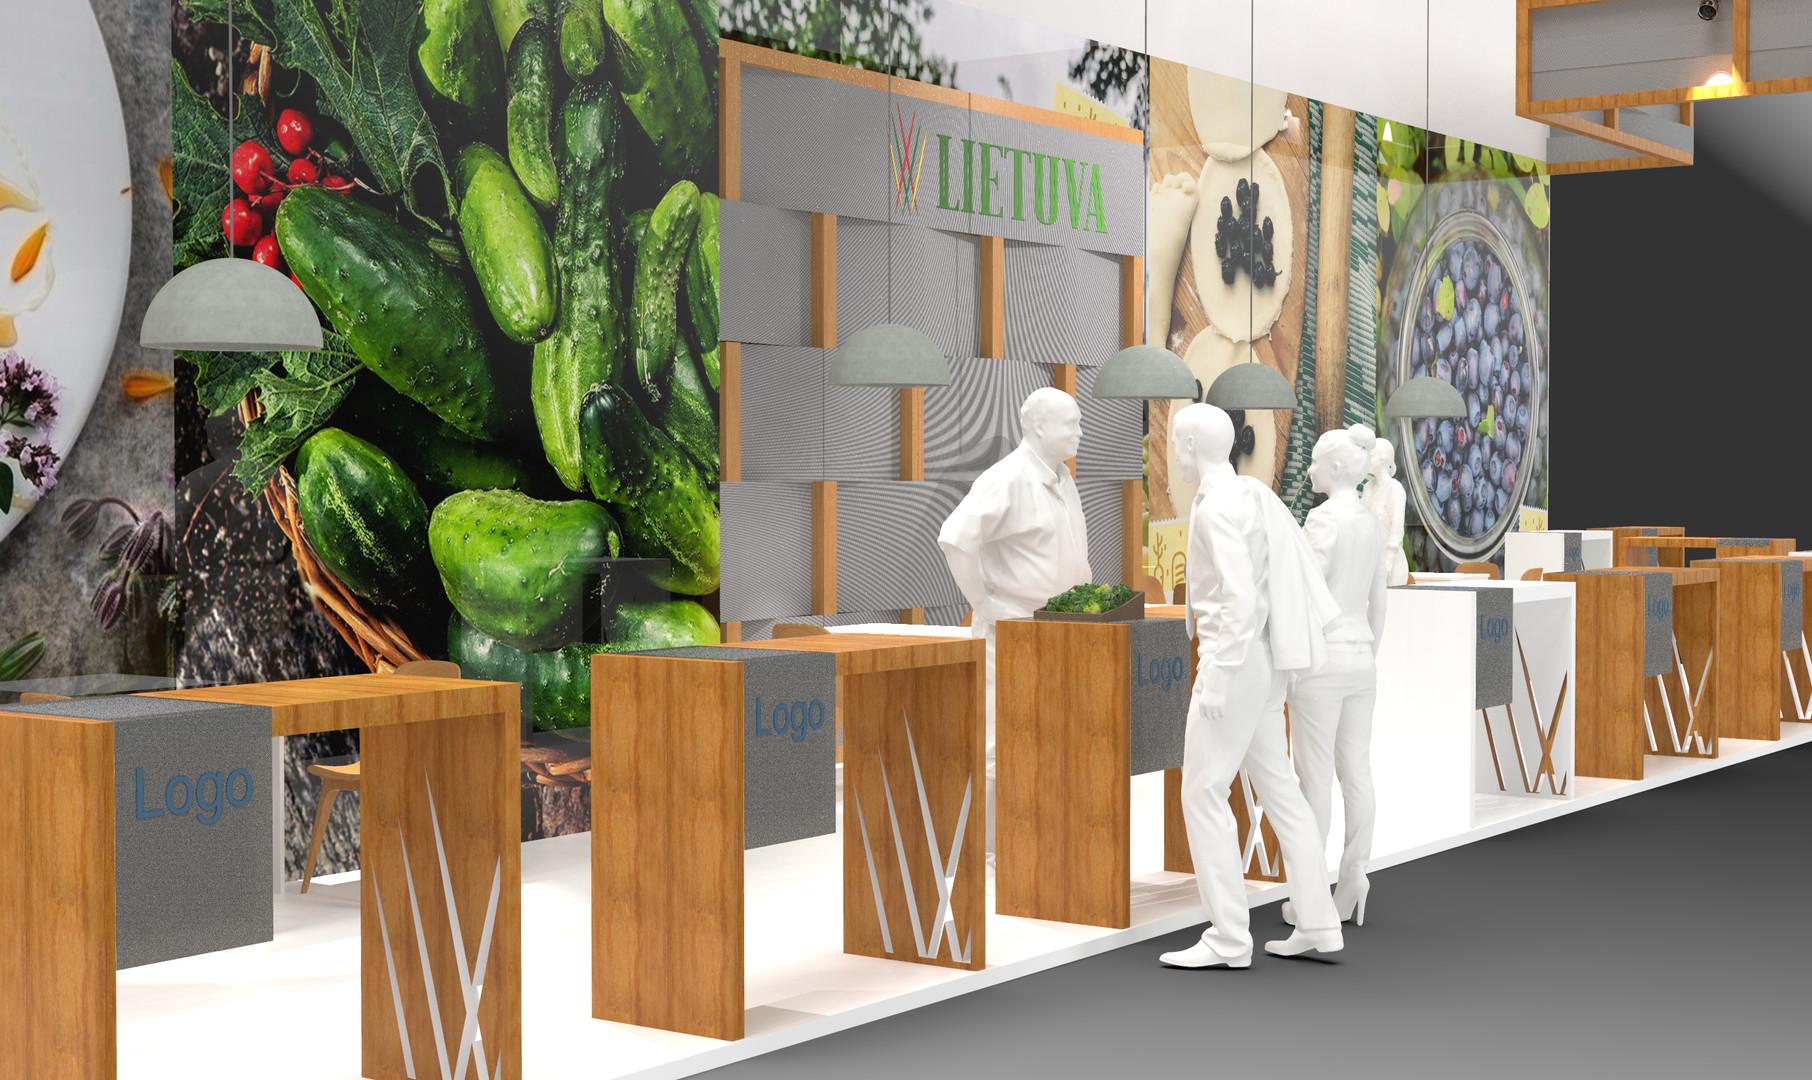 Exhibition space rendering